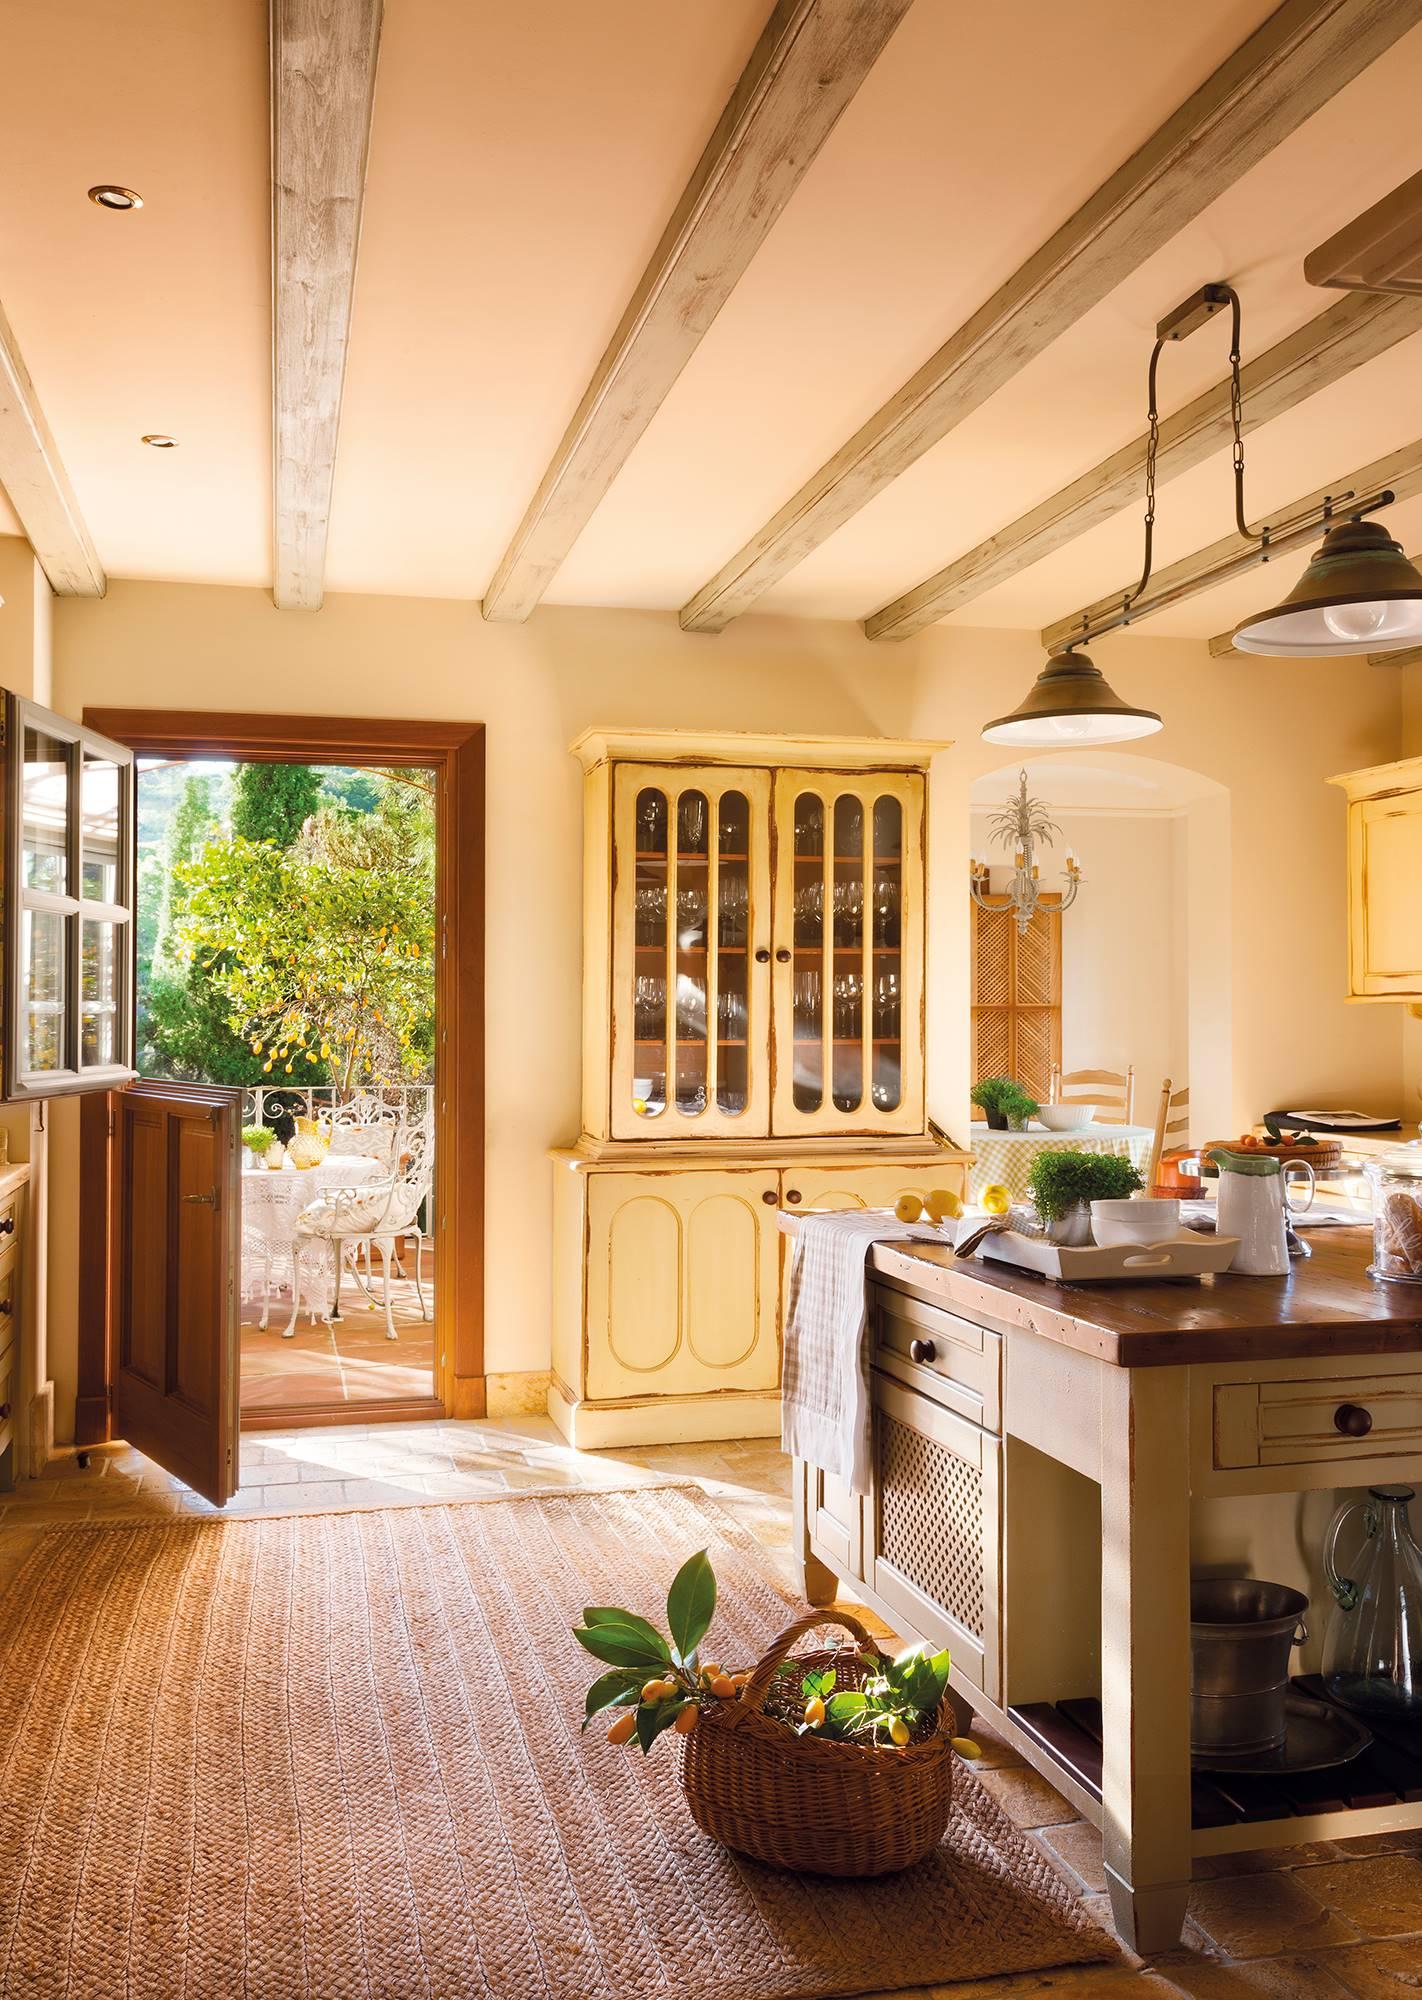 rustic style kitchen_381512.  A 100% farmhouse kitchen